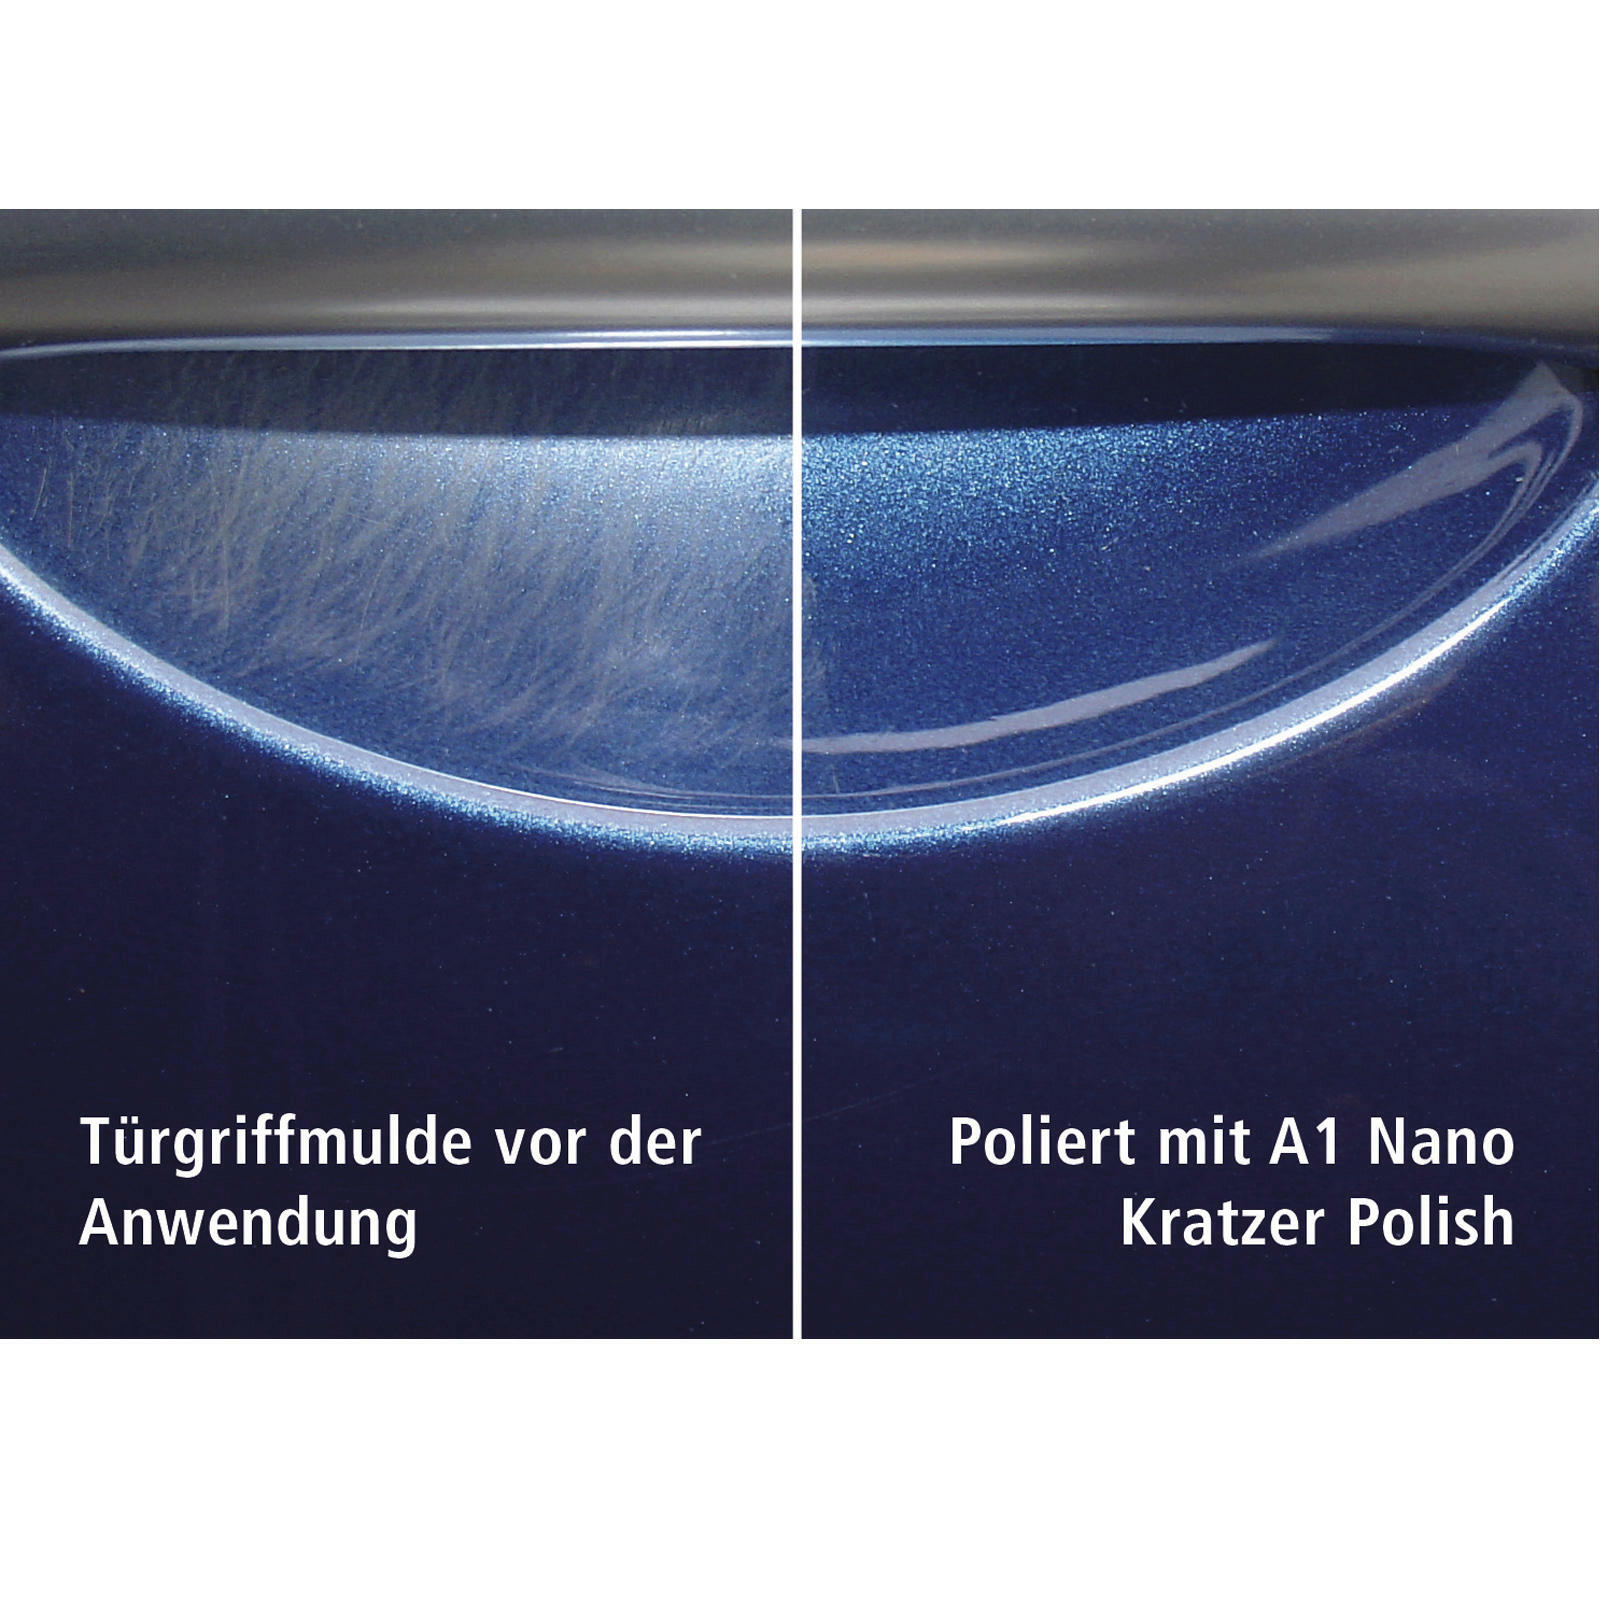 Dr. Wack A1 Nano Kratzer Polish 50 ML Nano-Tech-Politur brillante Oberfläche